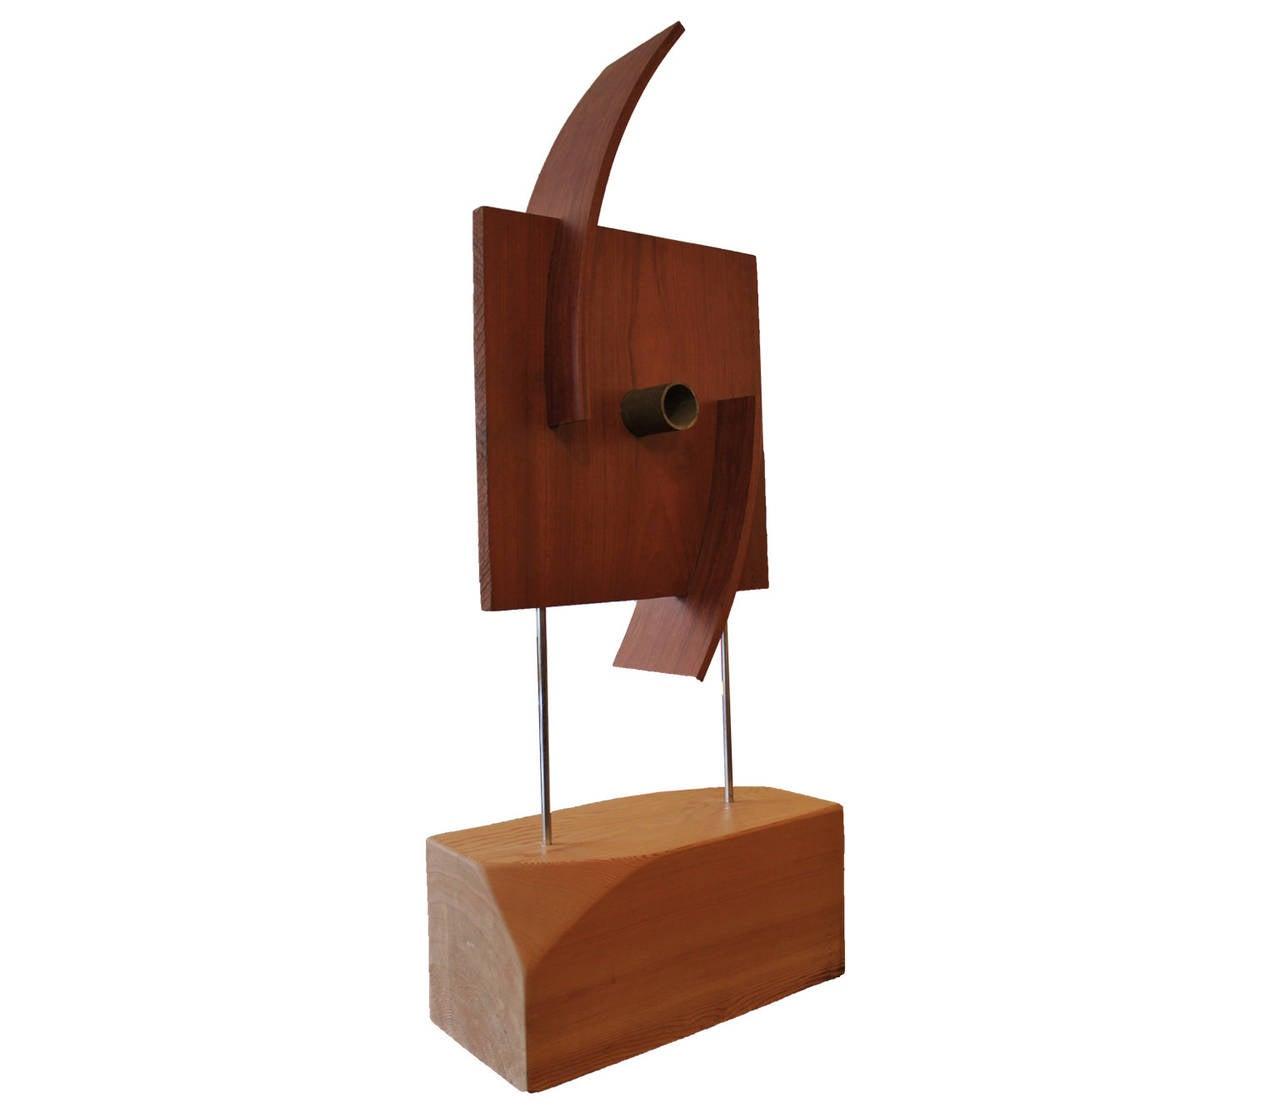 Organic Modern Furniture Organic Modern Wooden Sculpture For Sale At 1stdibs